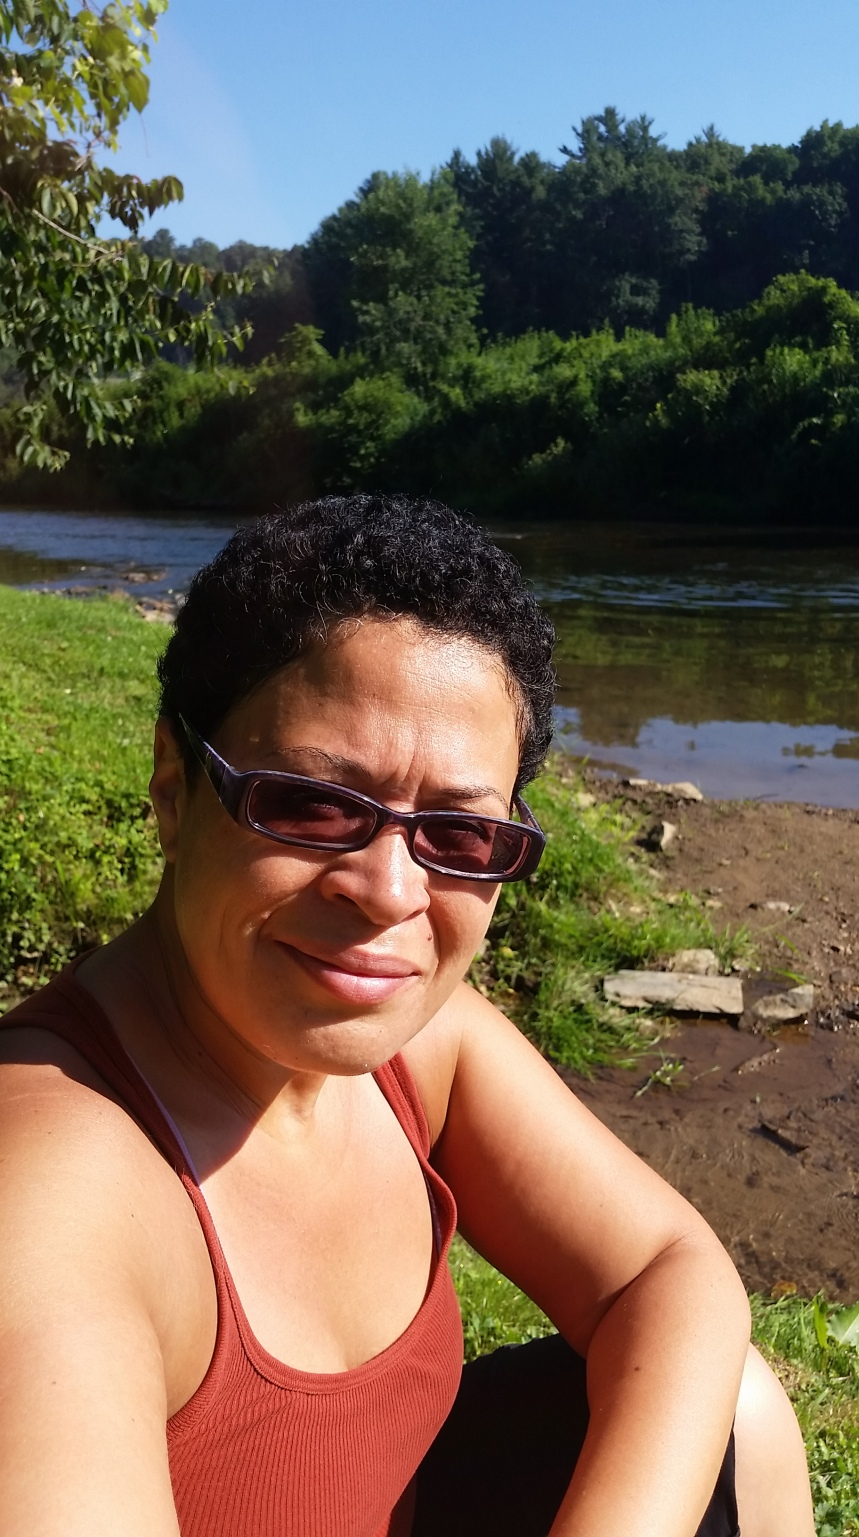 Pre-meditation selfie